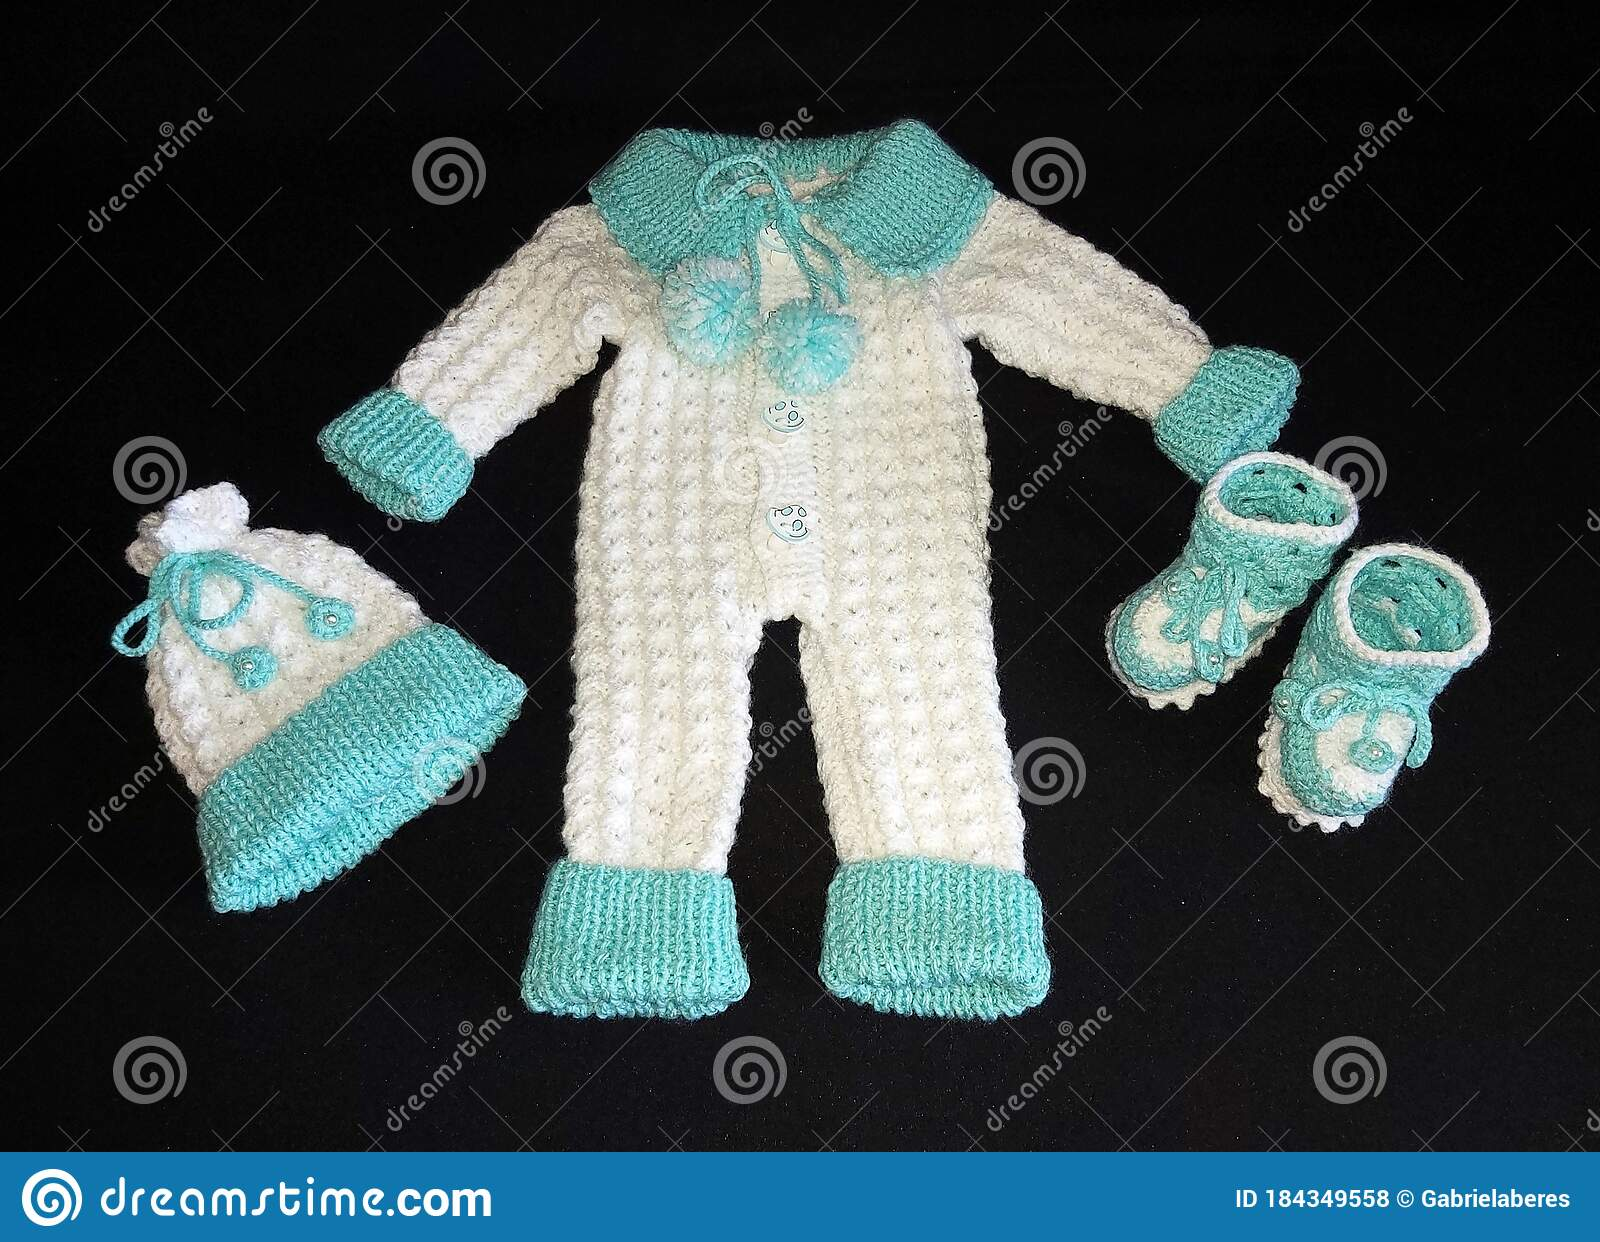 Brand New***Stunning Baby Hat***Hand knitted***Premature-newborn***FREE POSTAGE